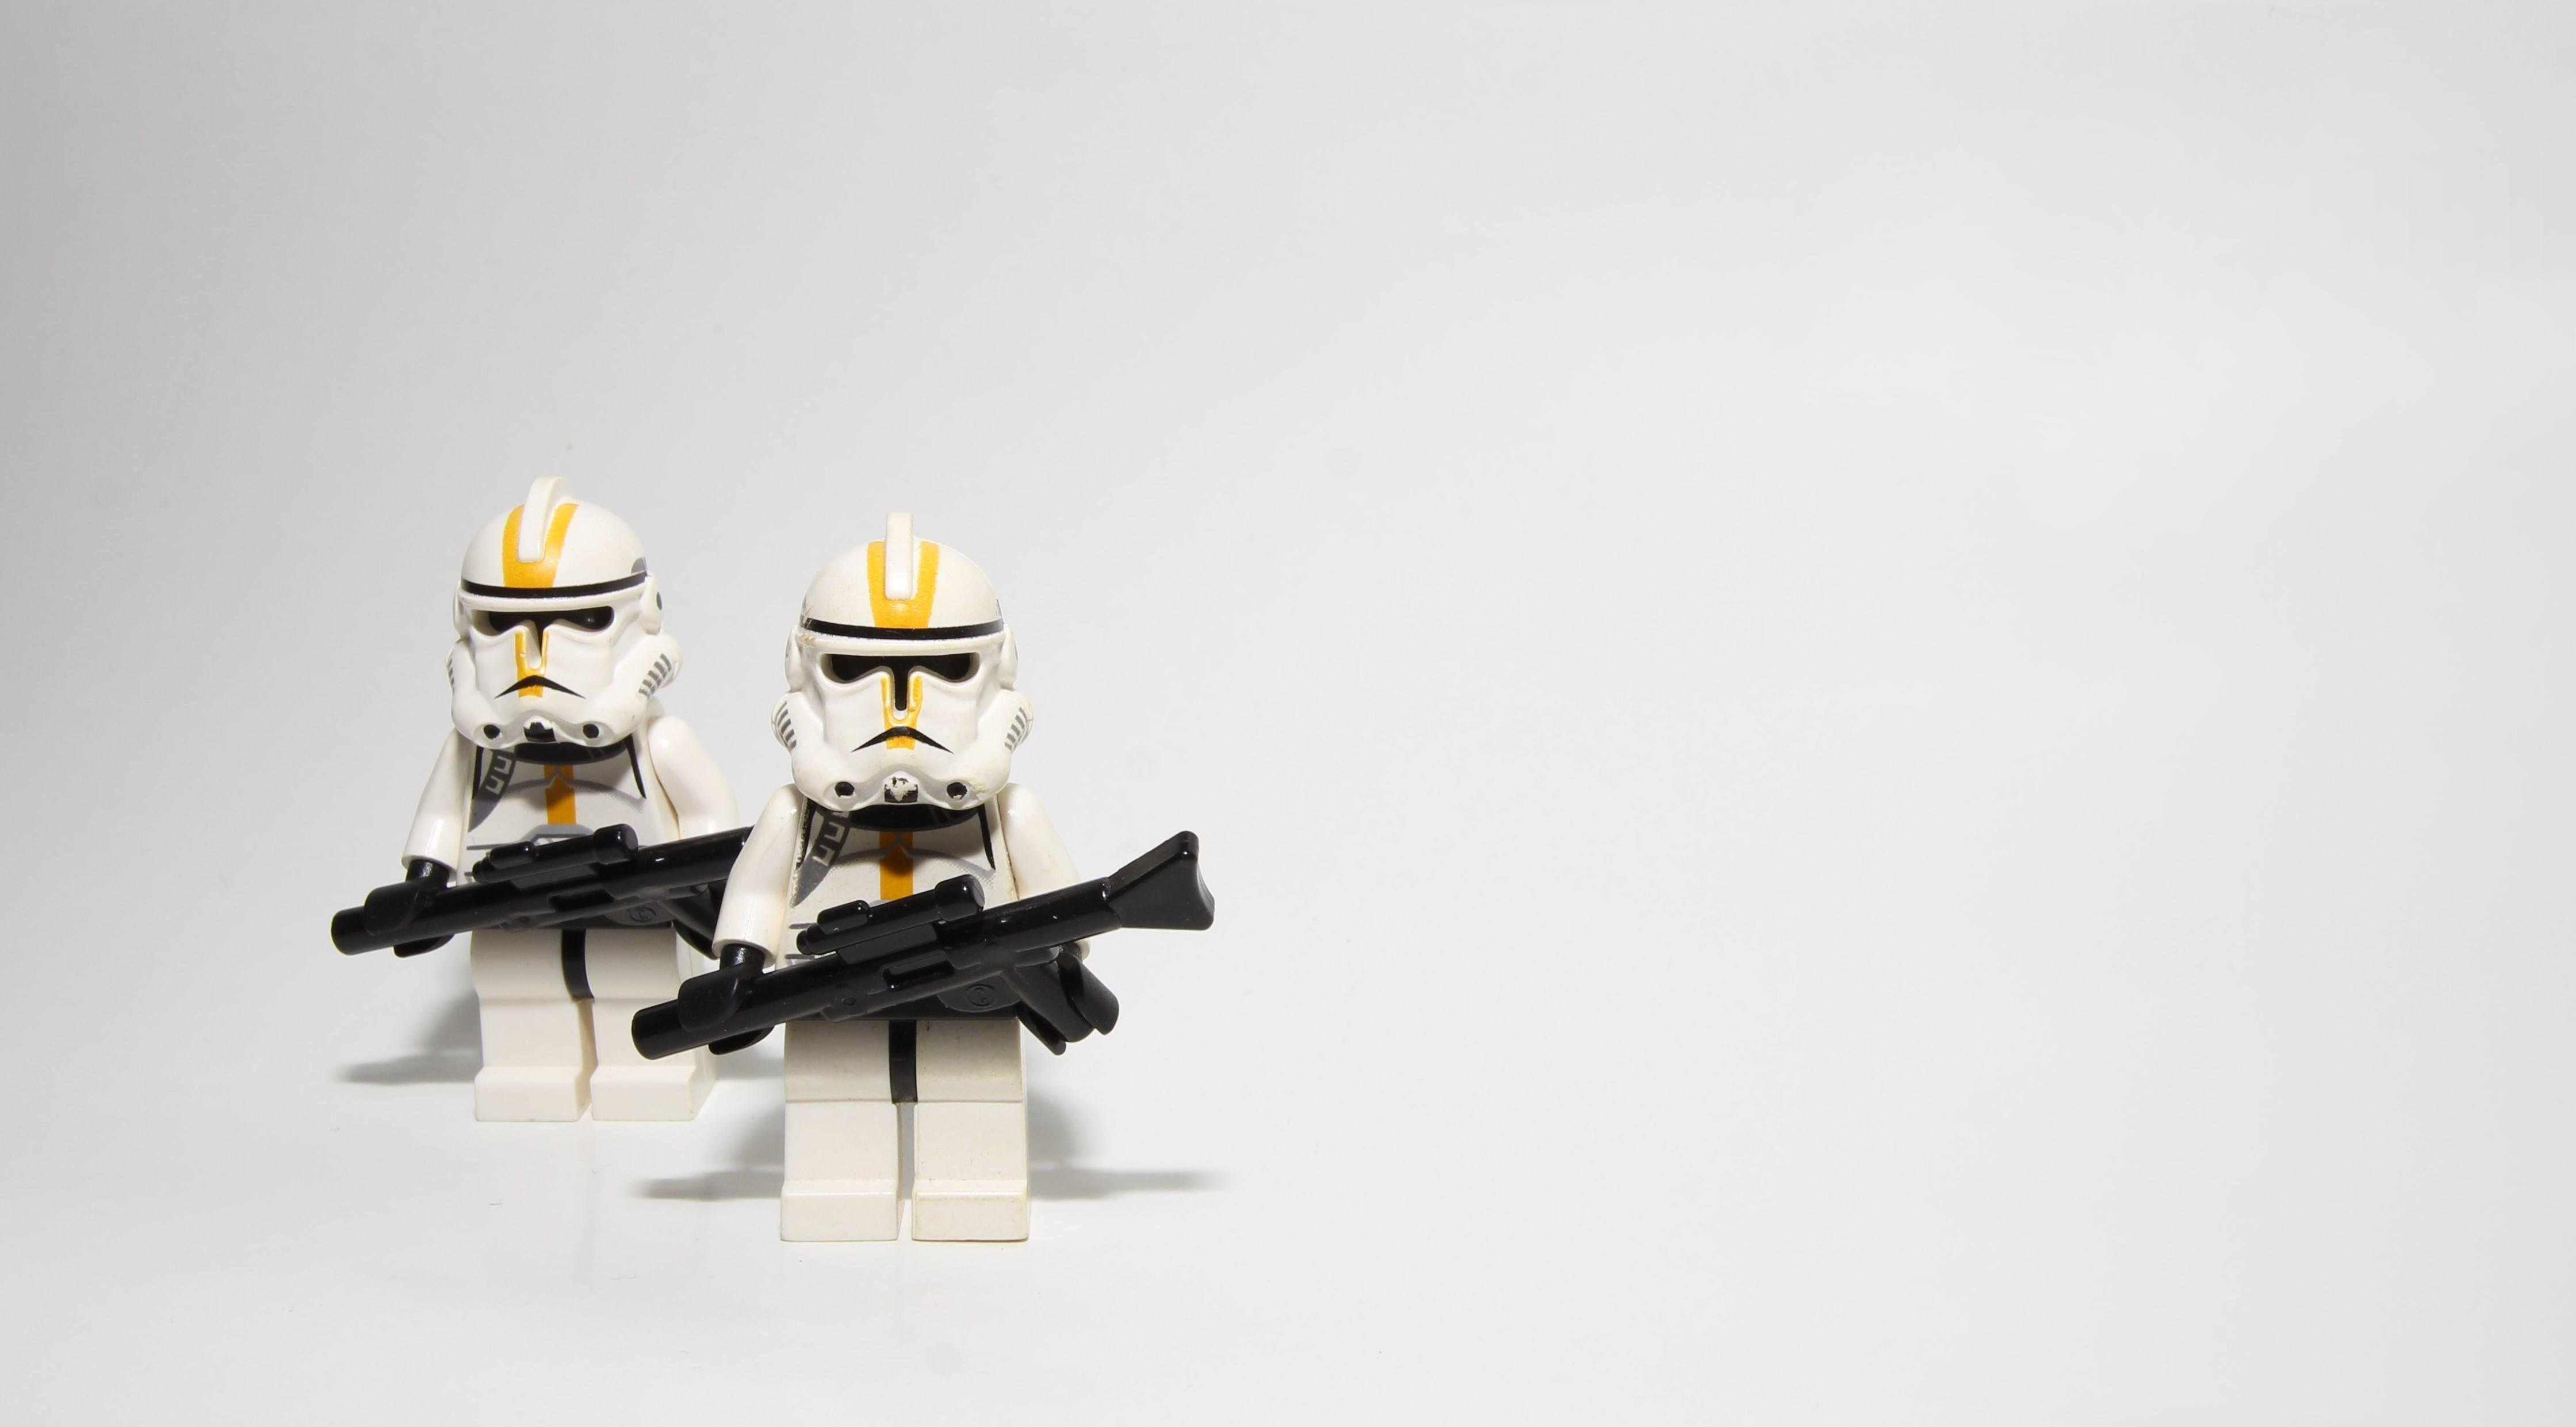 Lego Star Wars Clone Troopers 4k Wallpaper